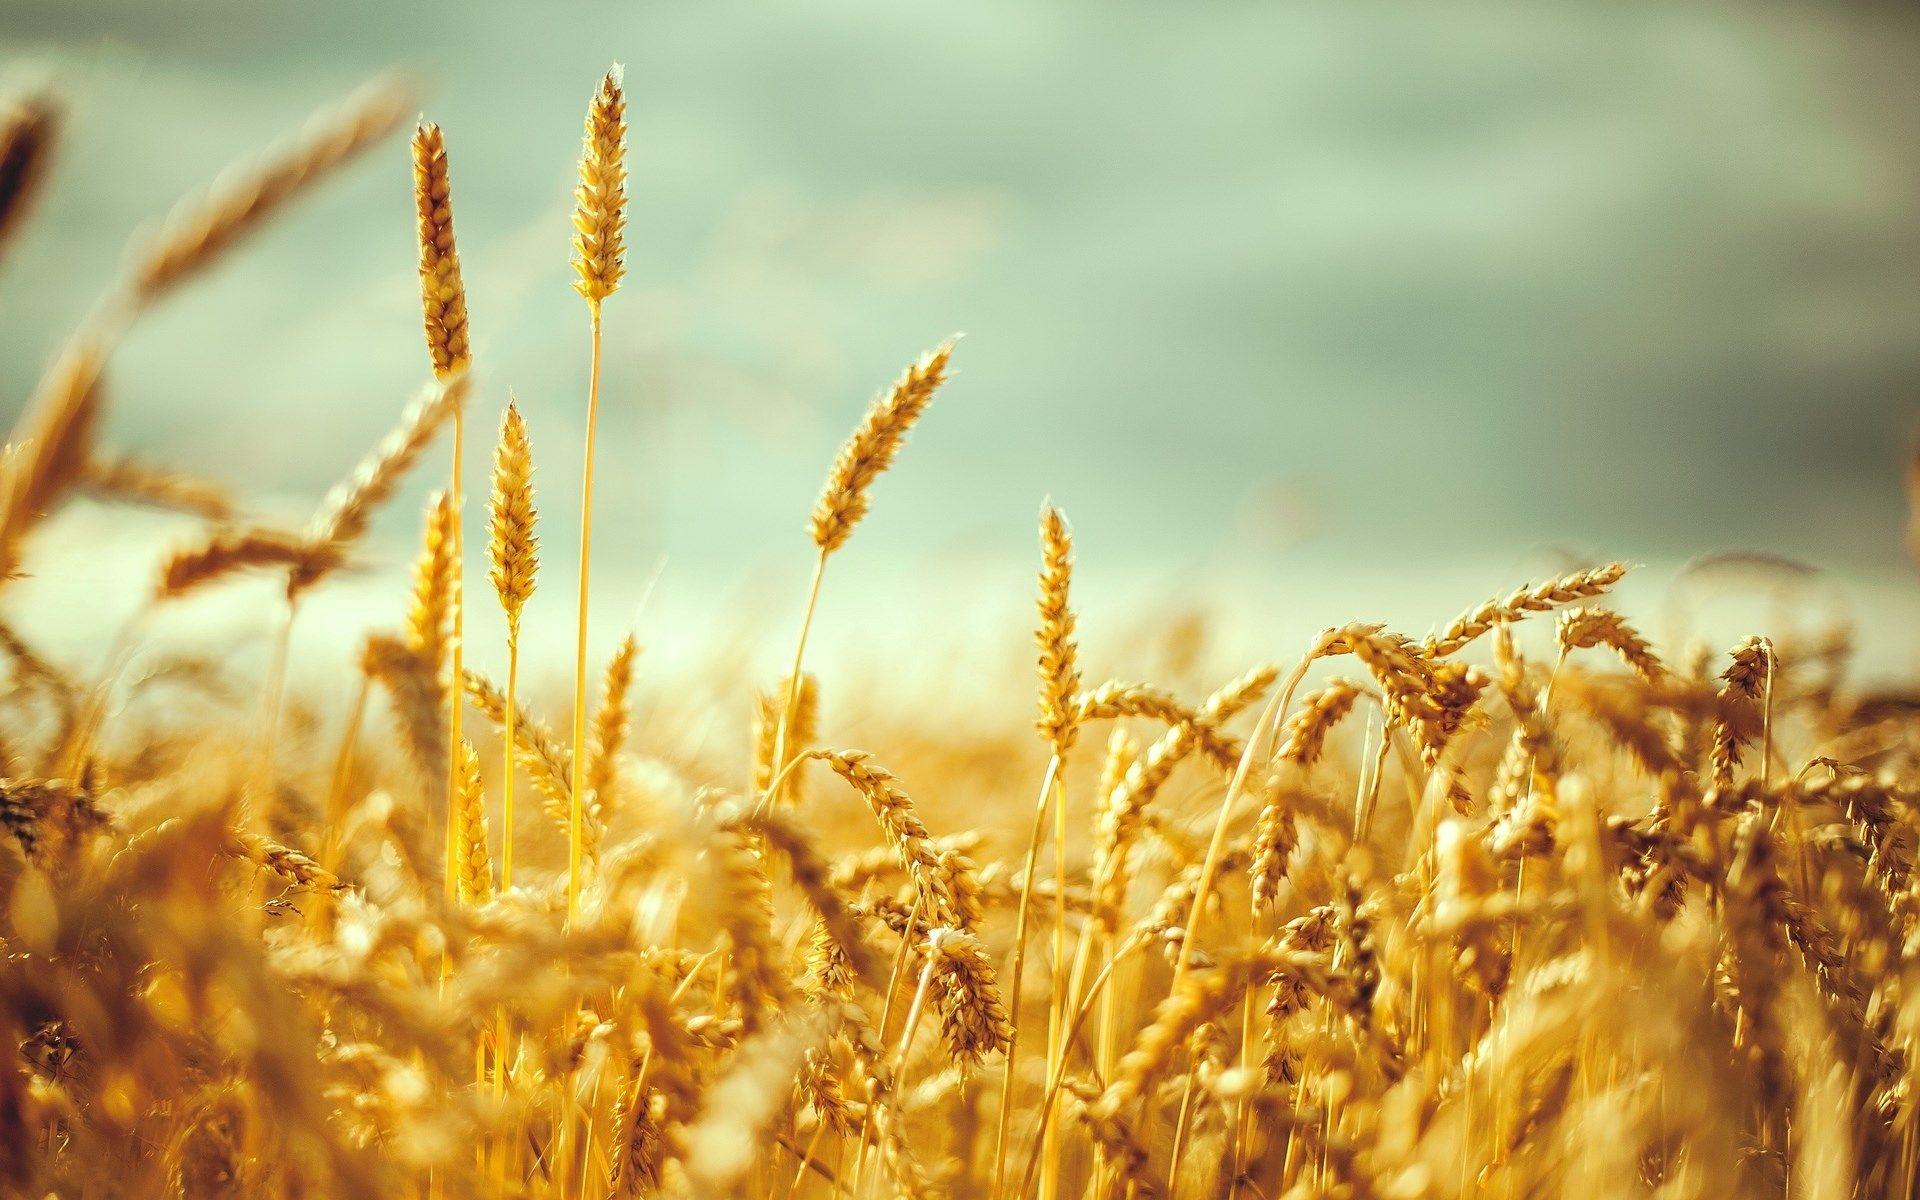 Wheat Wave Analysis – 25 November, 2019